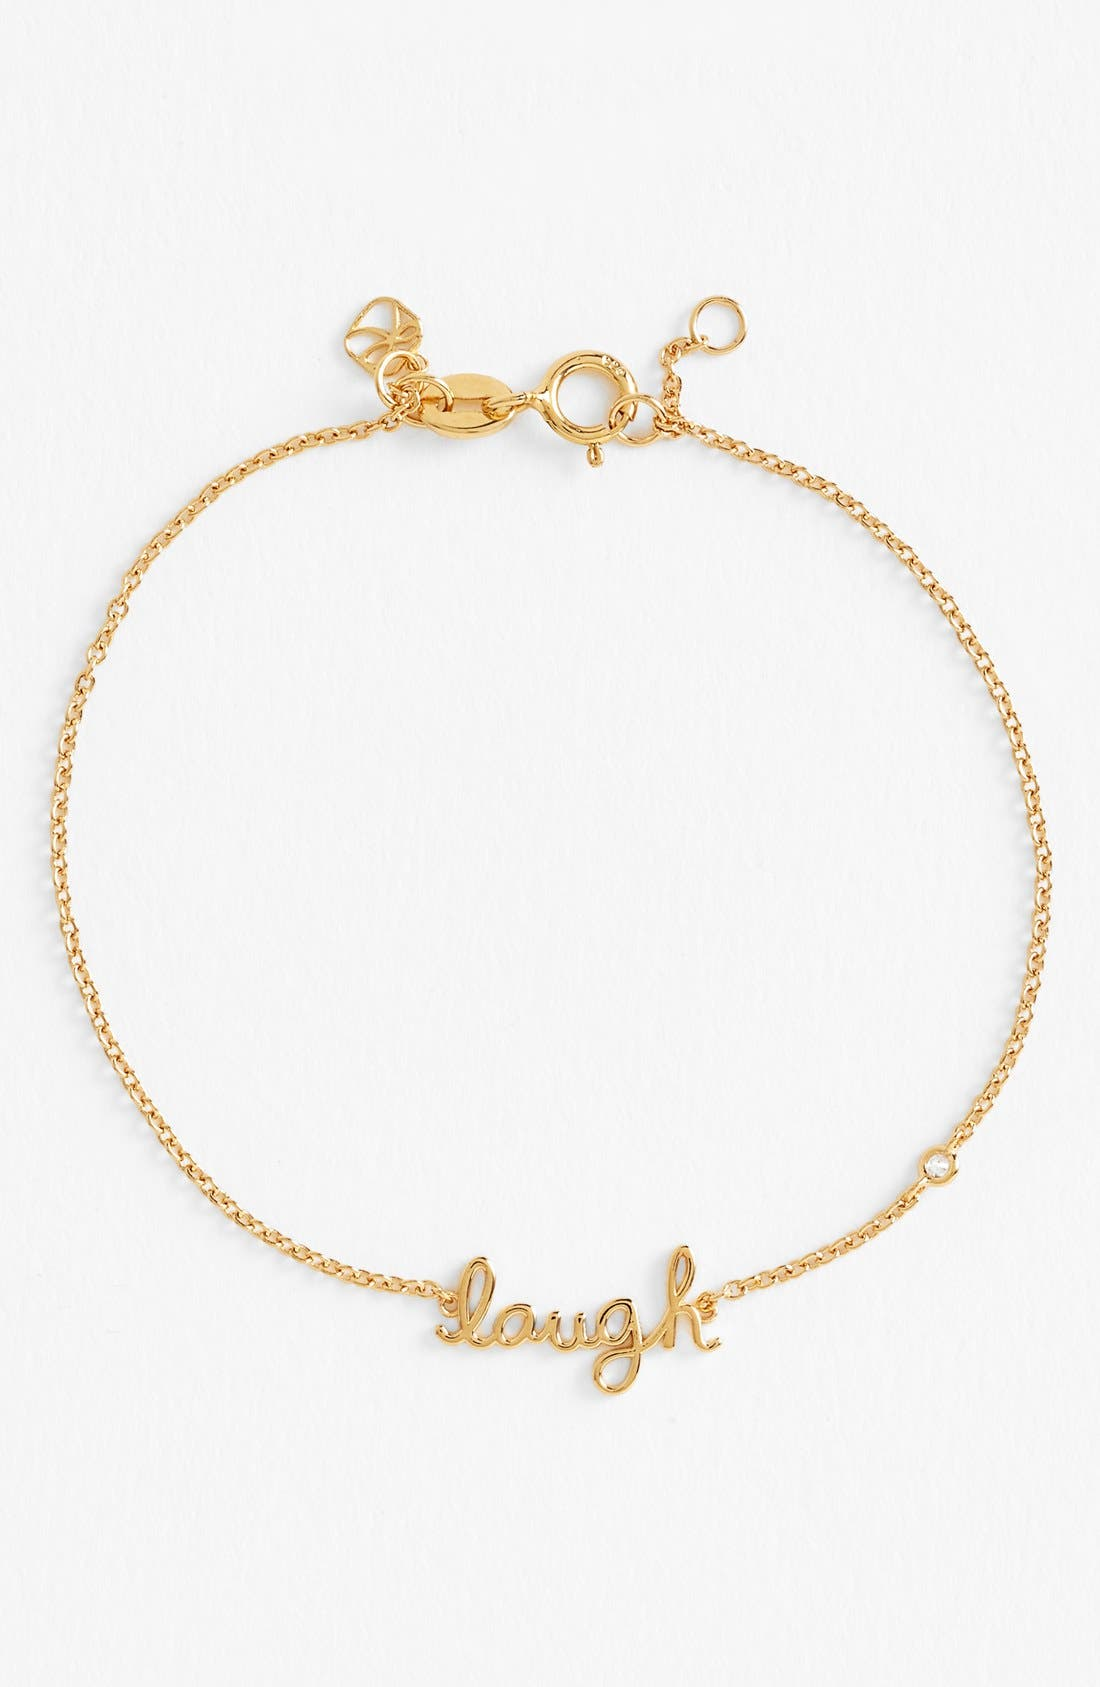 Alternate Image 1 Selected - SHY by Sydney Evan 'Laugh' Bracelet